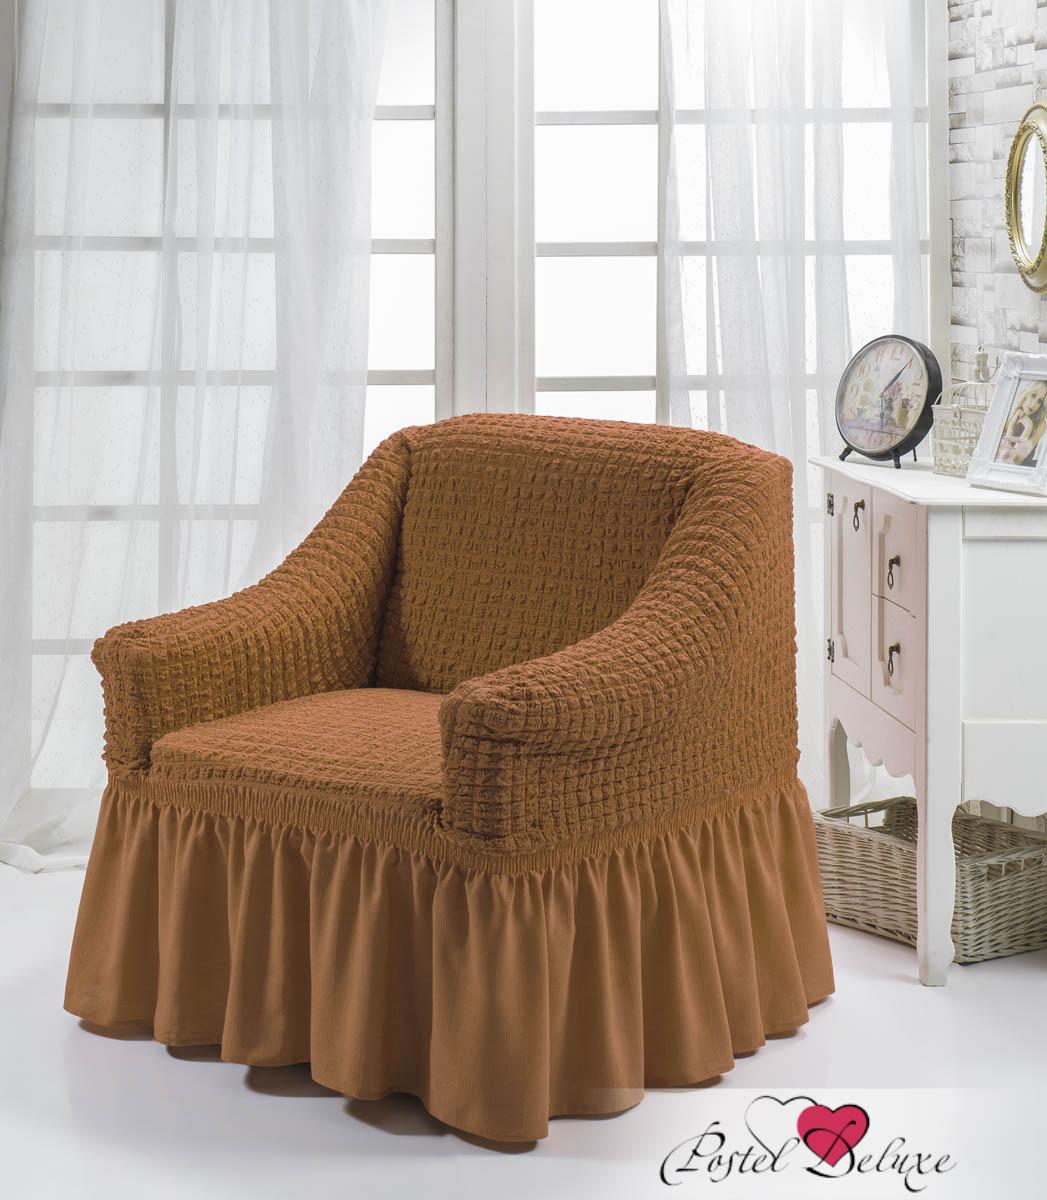 {} BULSAN Чехол для кресла Bulsan Цвет: Горчичный bulsan набор чехлов для дивана bulsan цвет горчичный